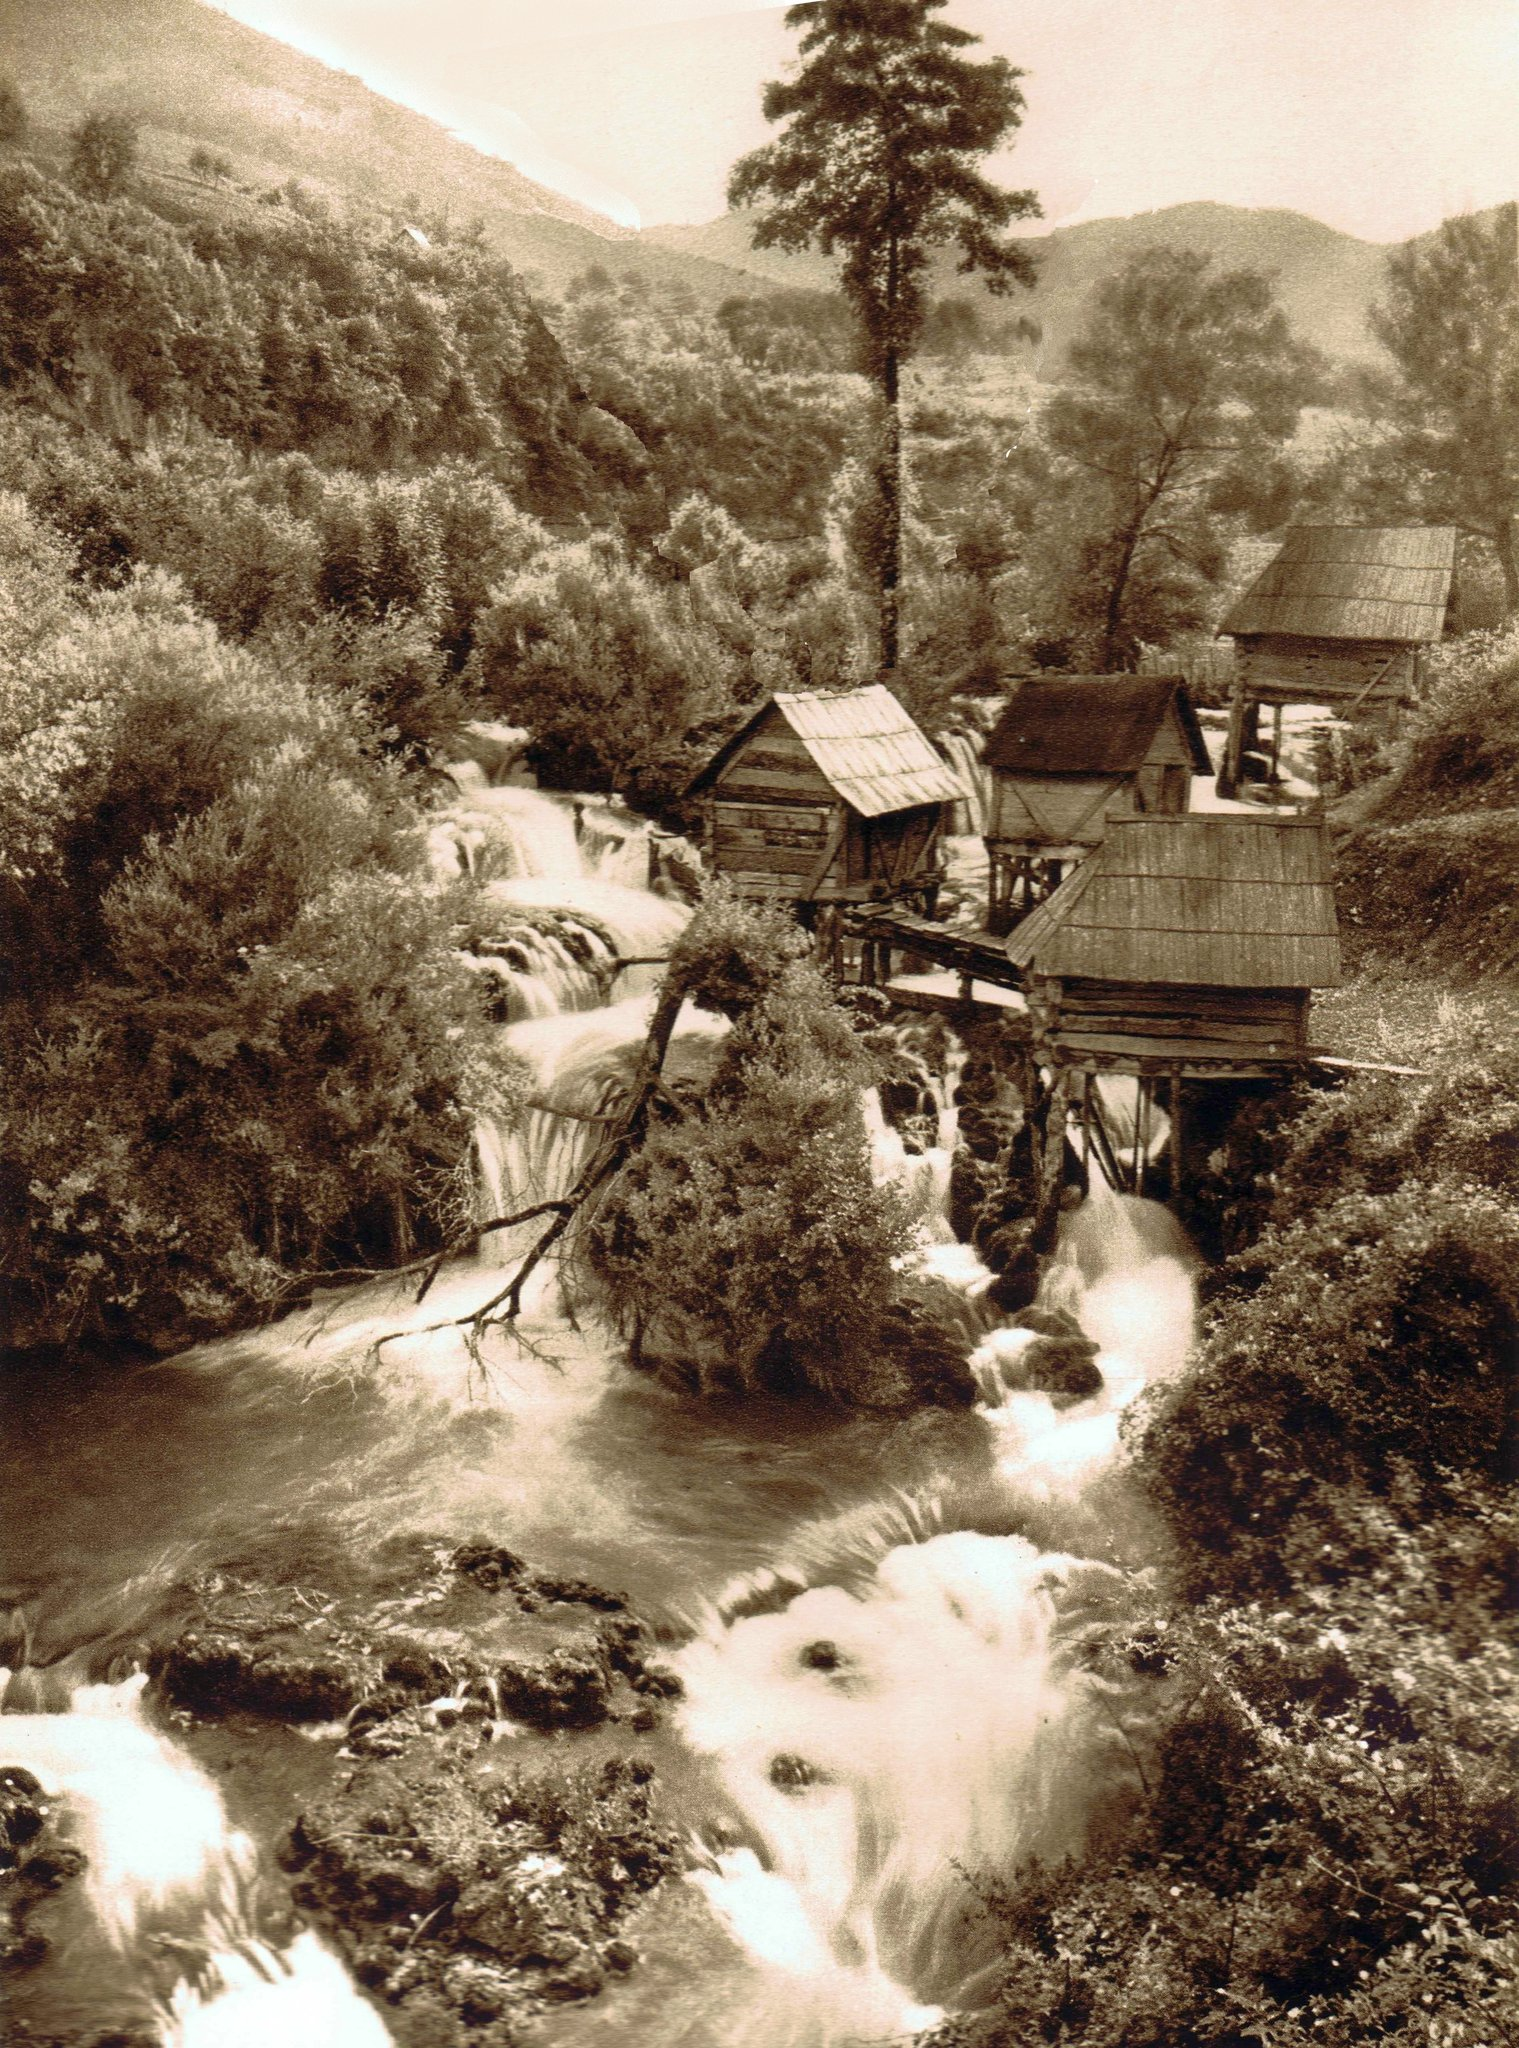 瀑布 Wasserfall Ein Klassisches Chinesisches Gedicht Bedburg Hau